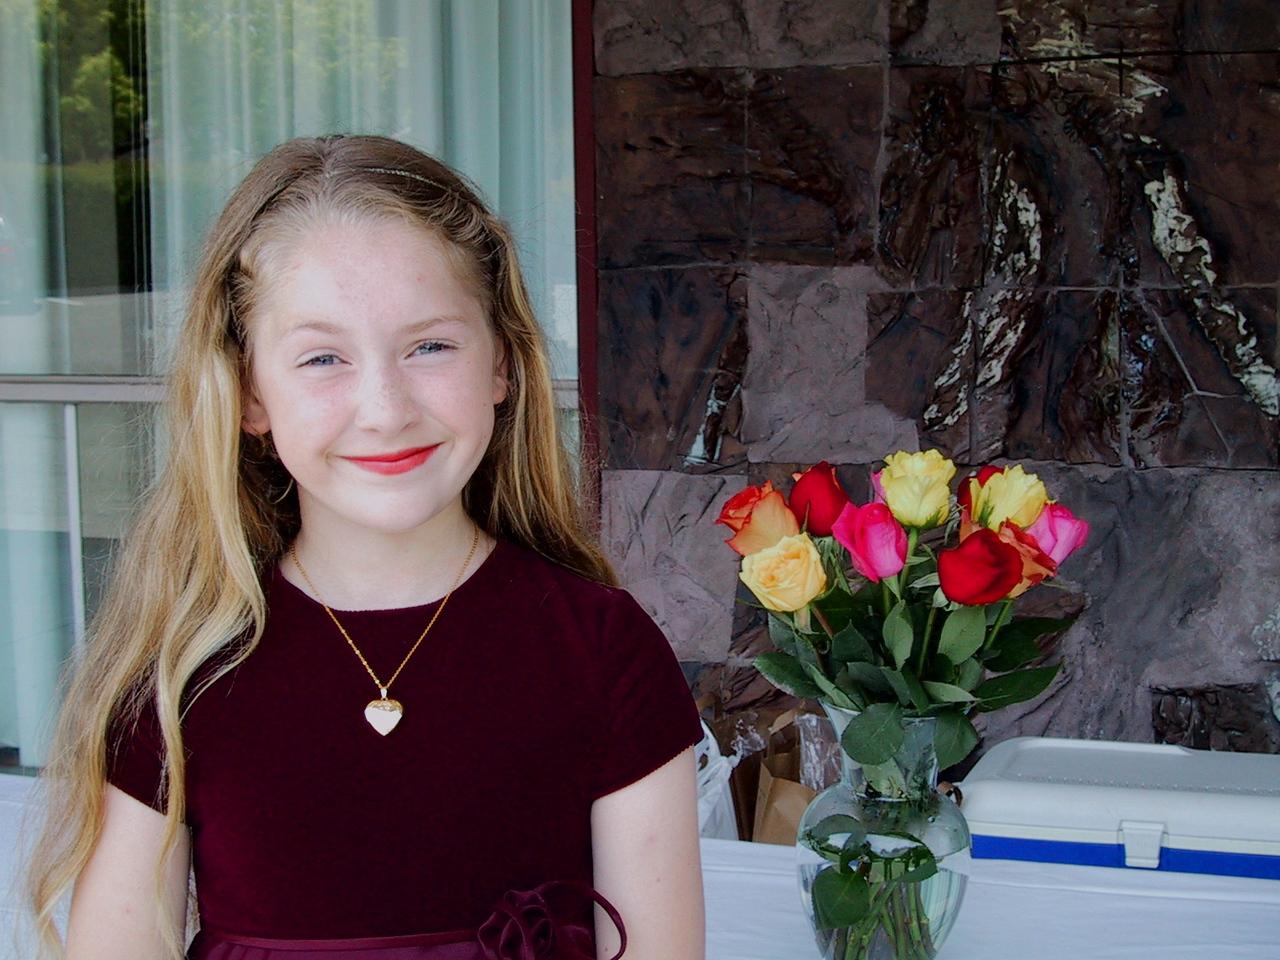 After winning an award at her piano recital.